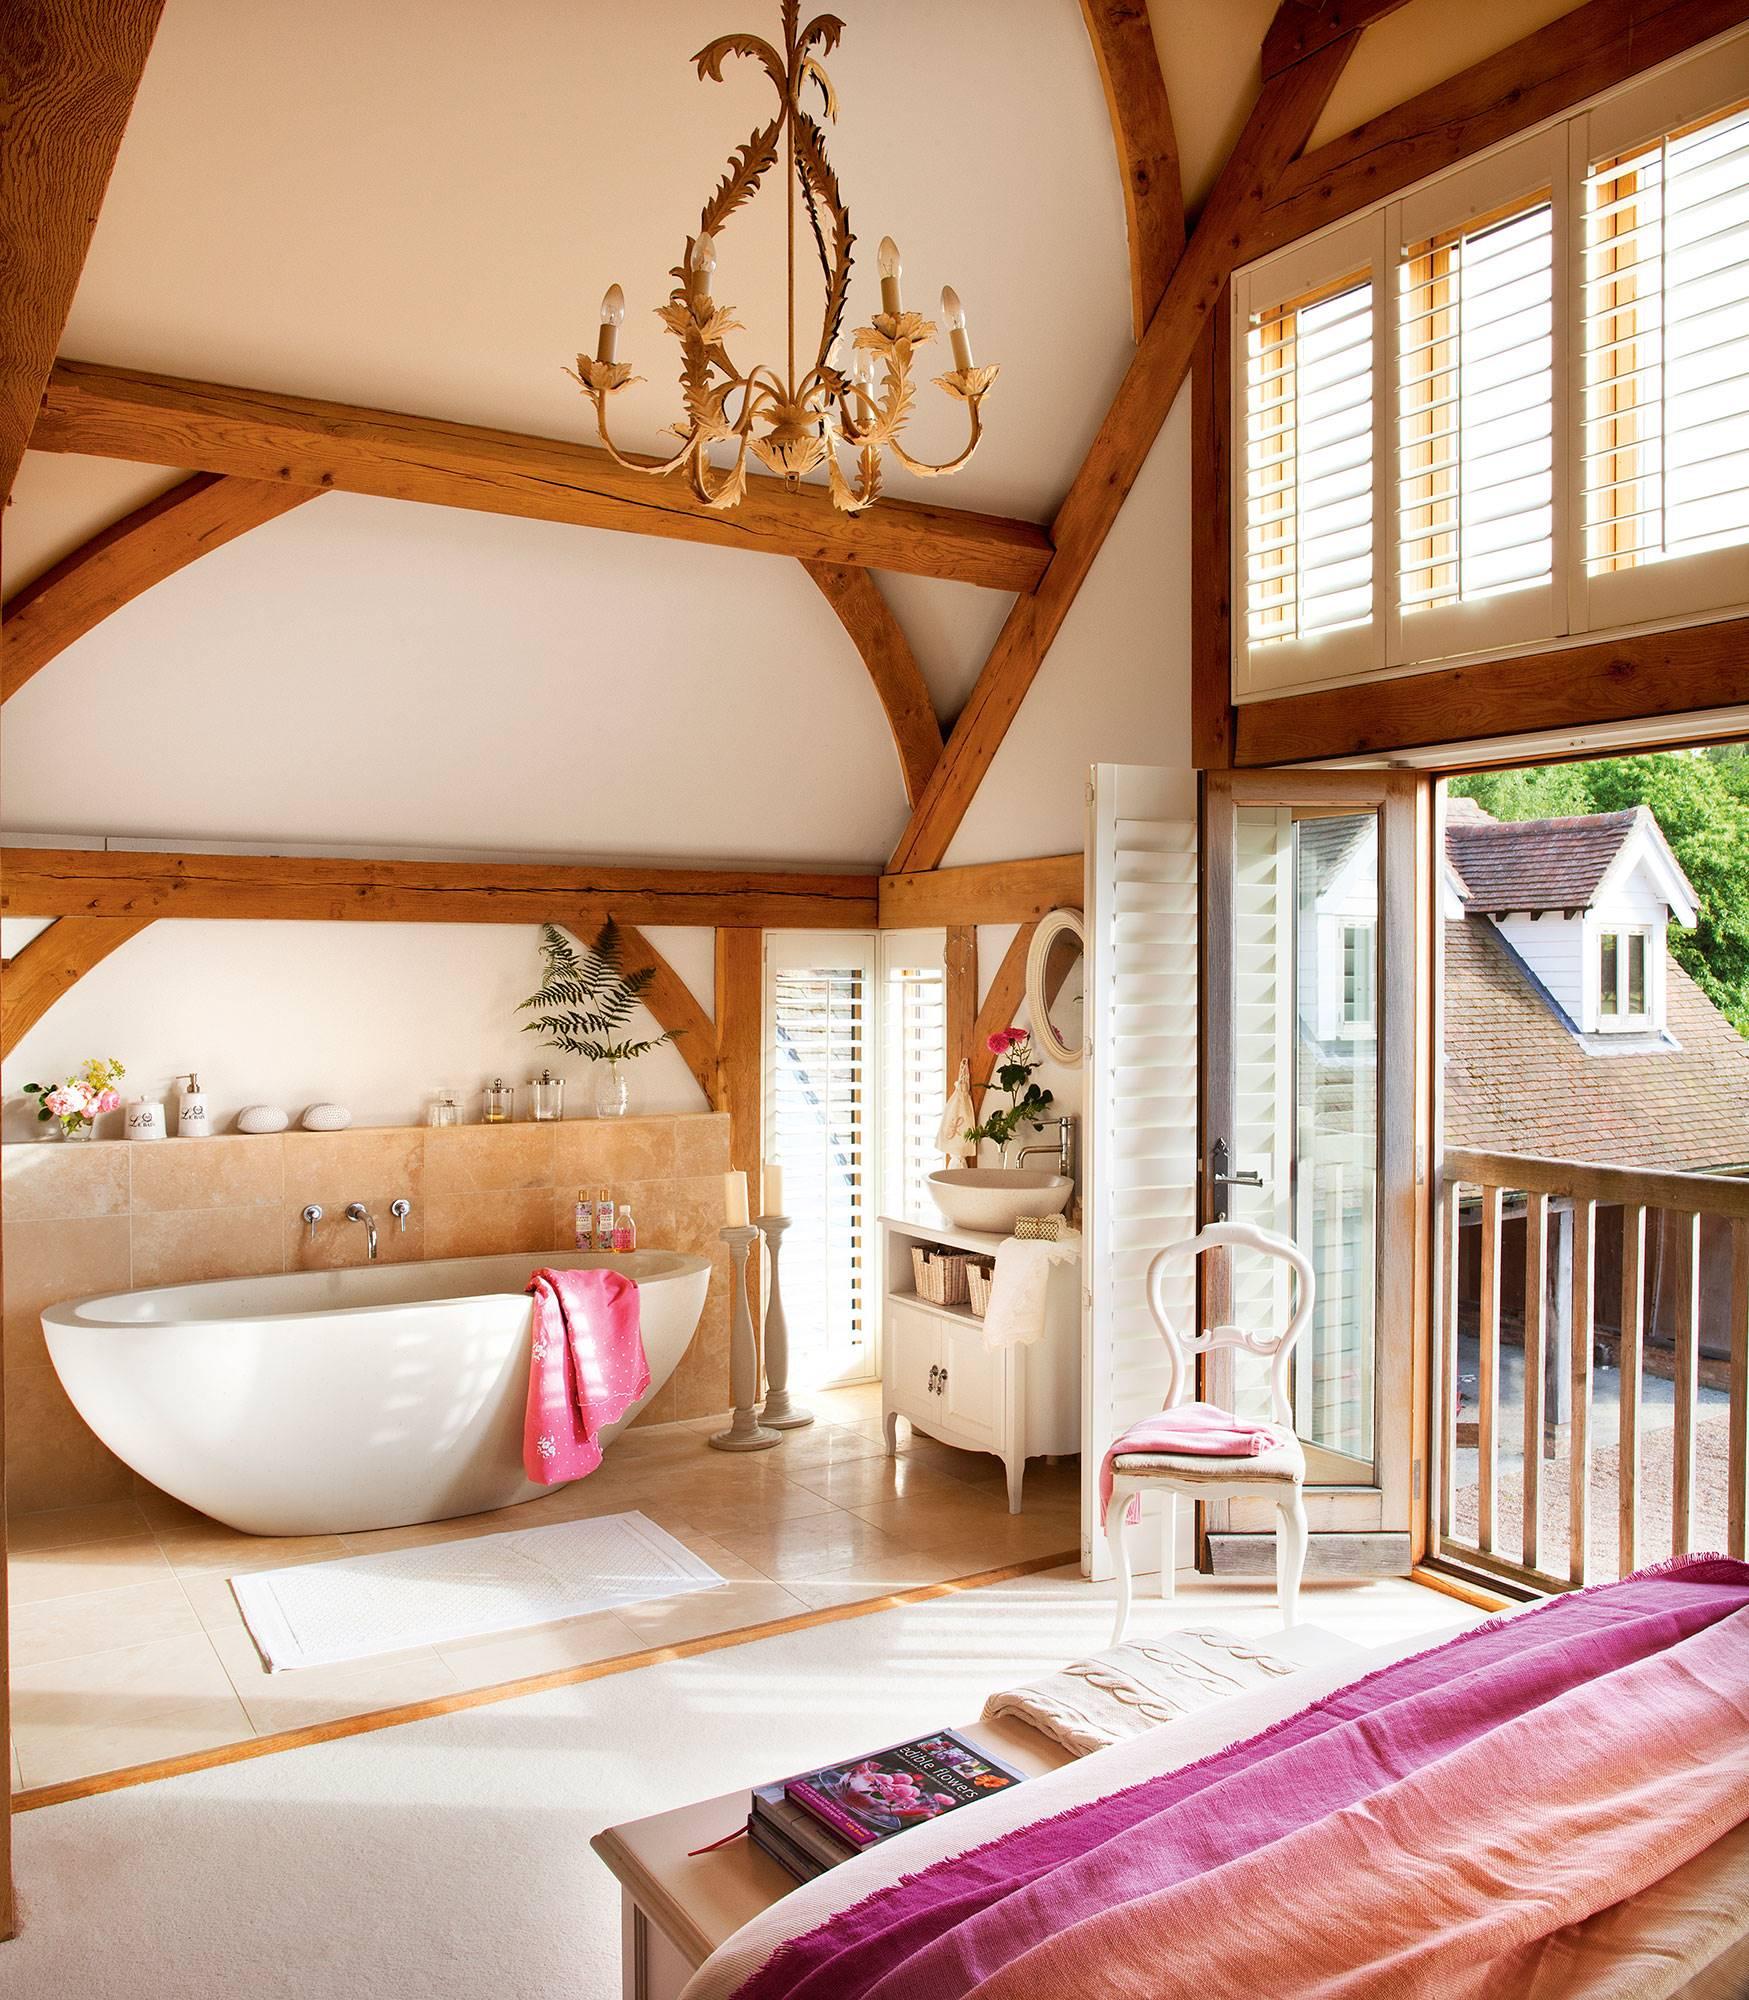 dormitorio-de-casa-de-campo-con-banera-ovalada-a-pie-de-cama 54055a50. Con bañera